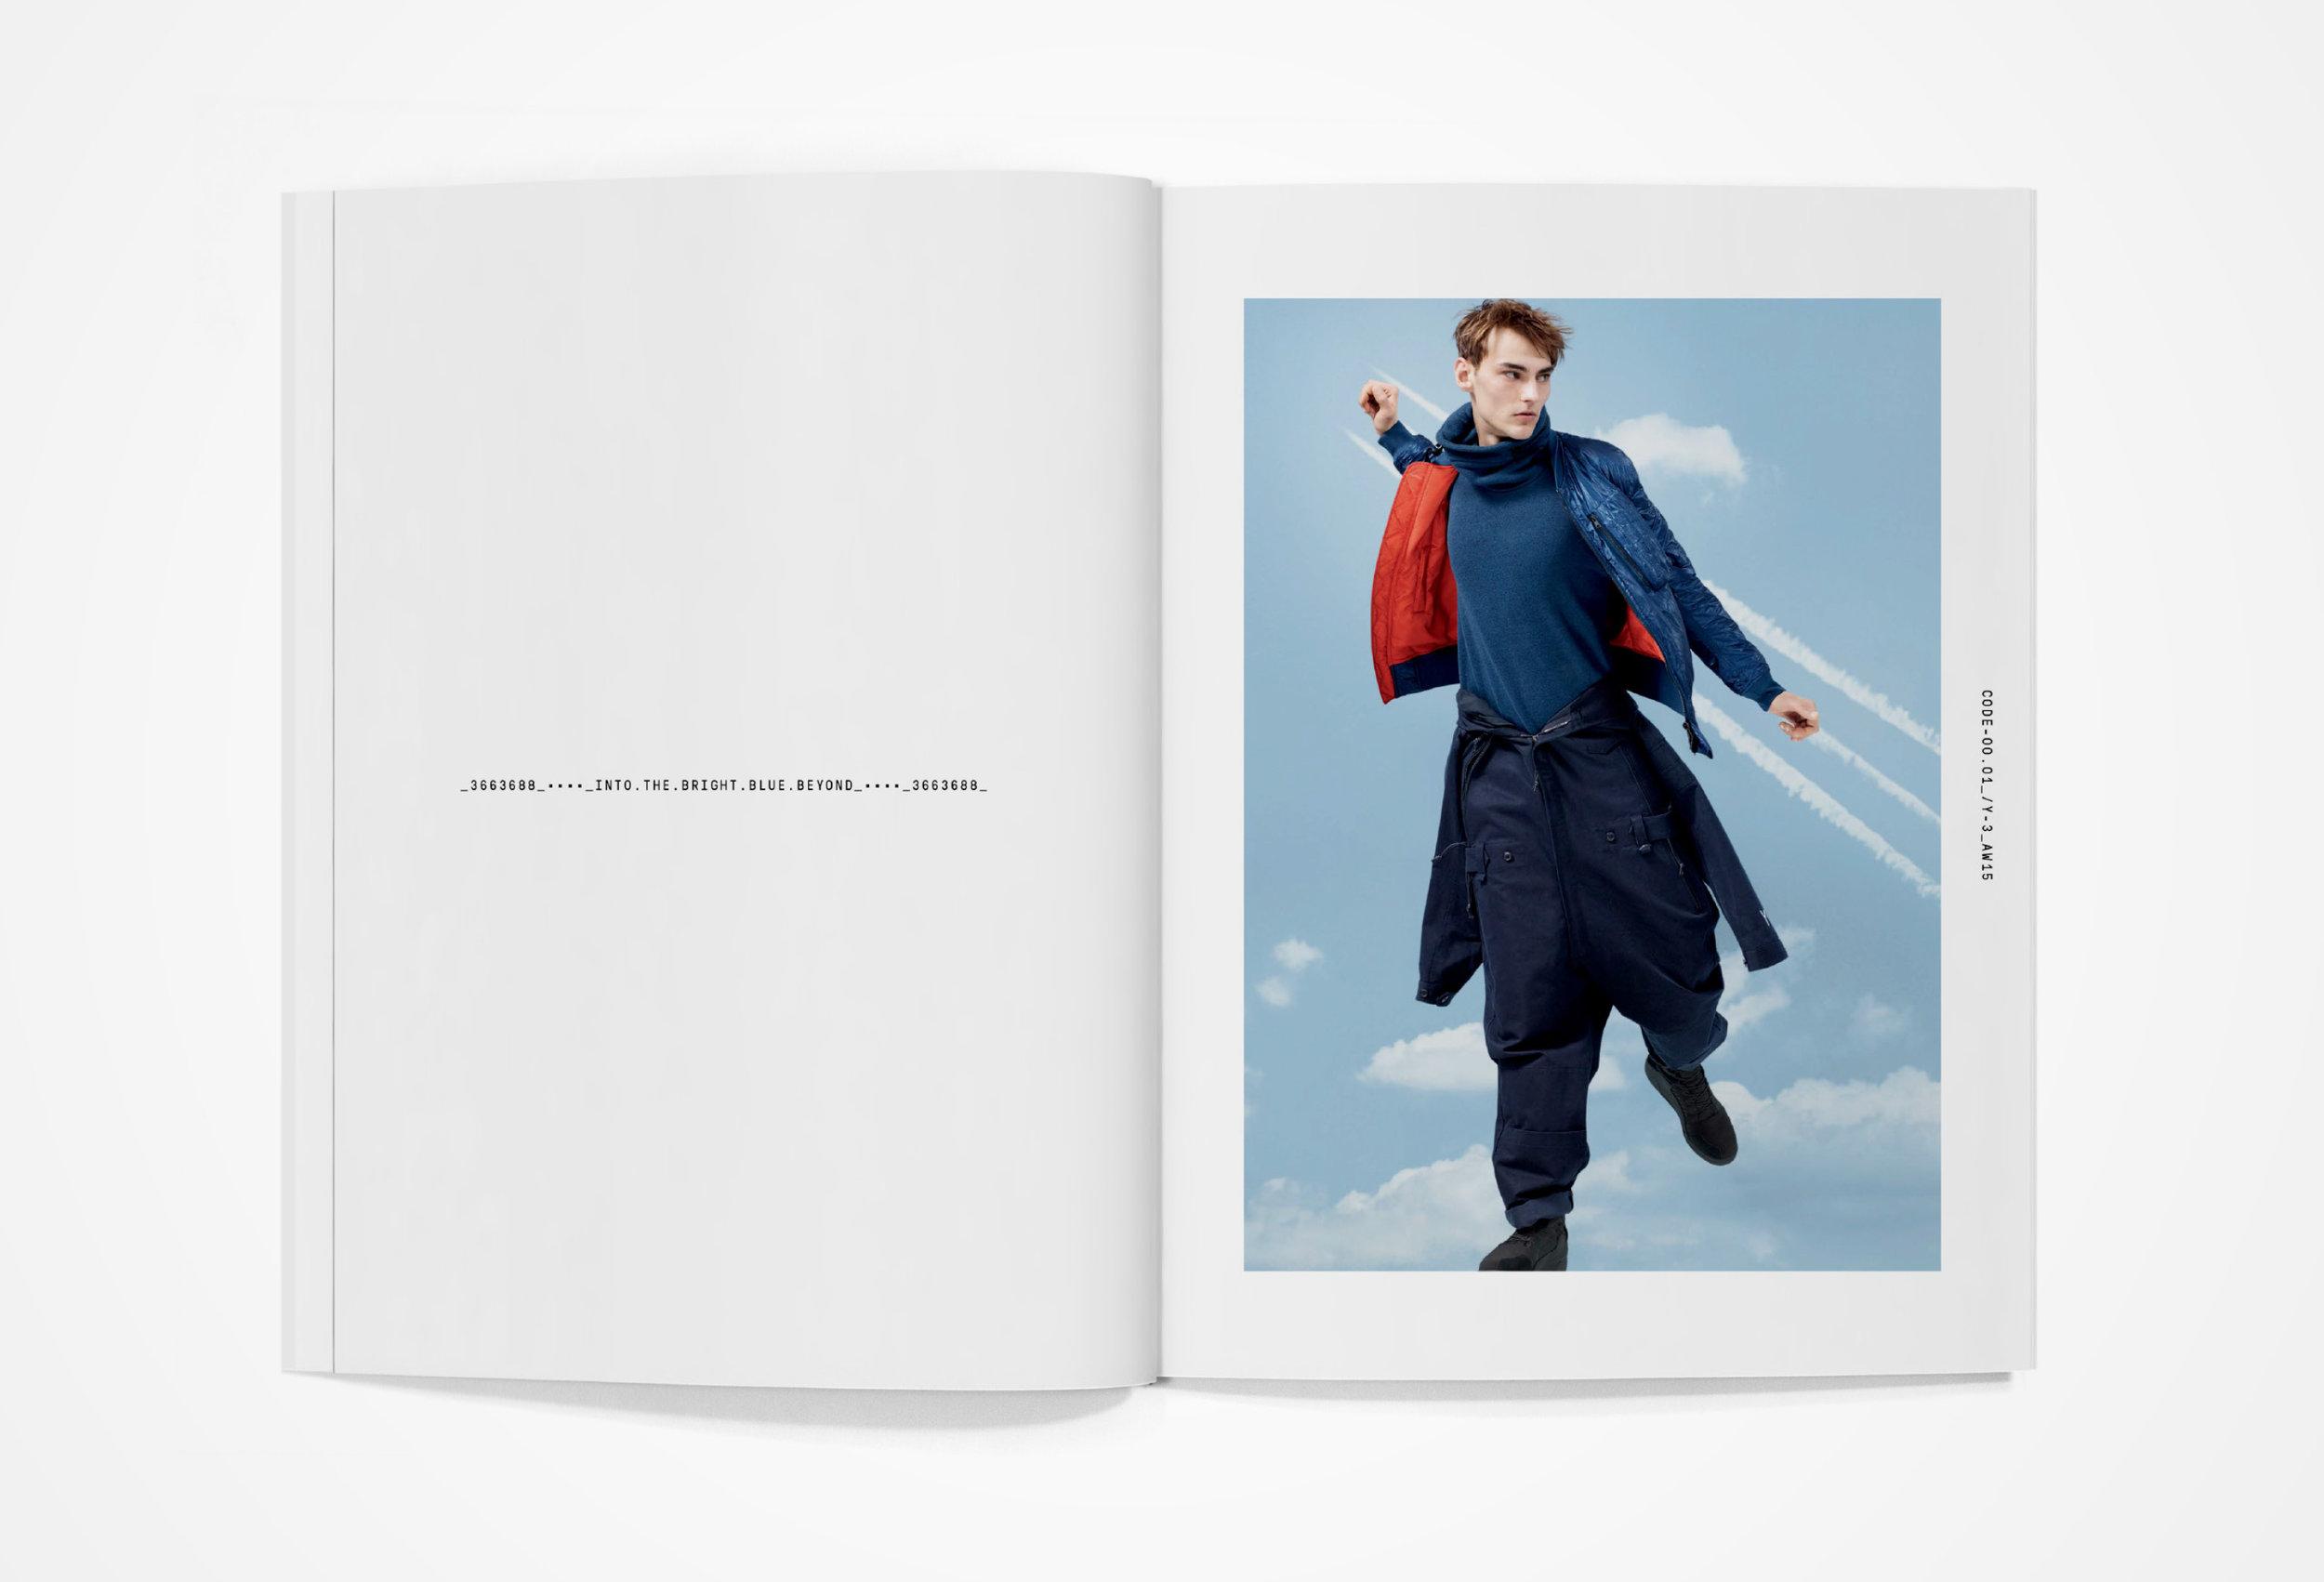 Y3-FW15_Book1.jpg